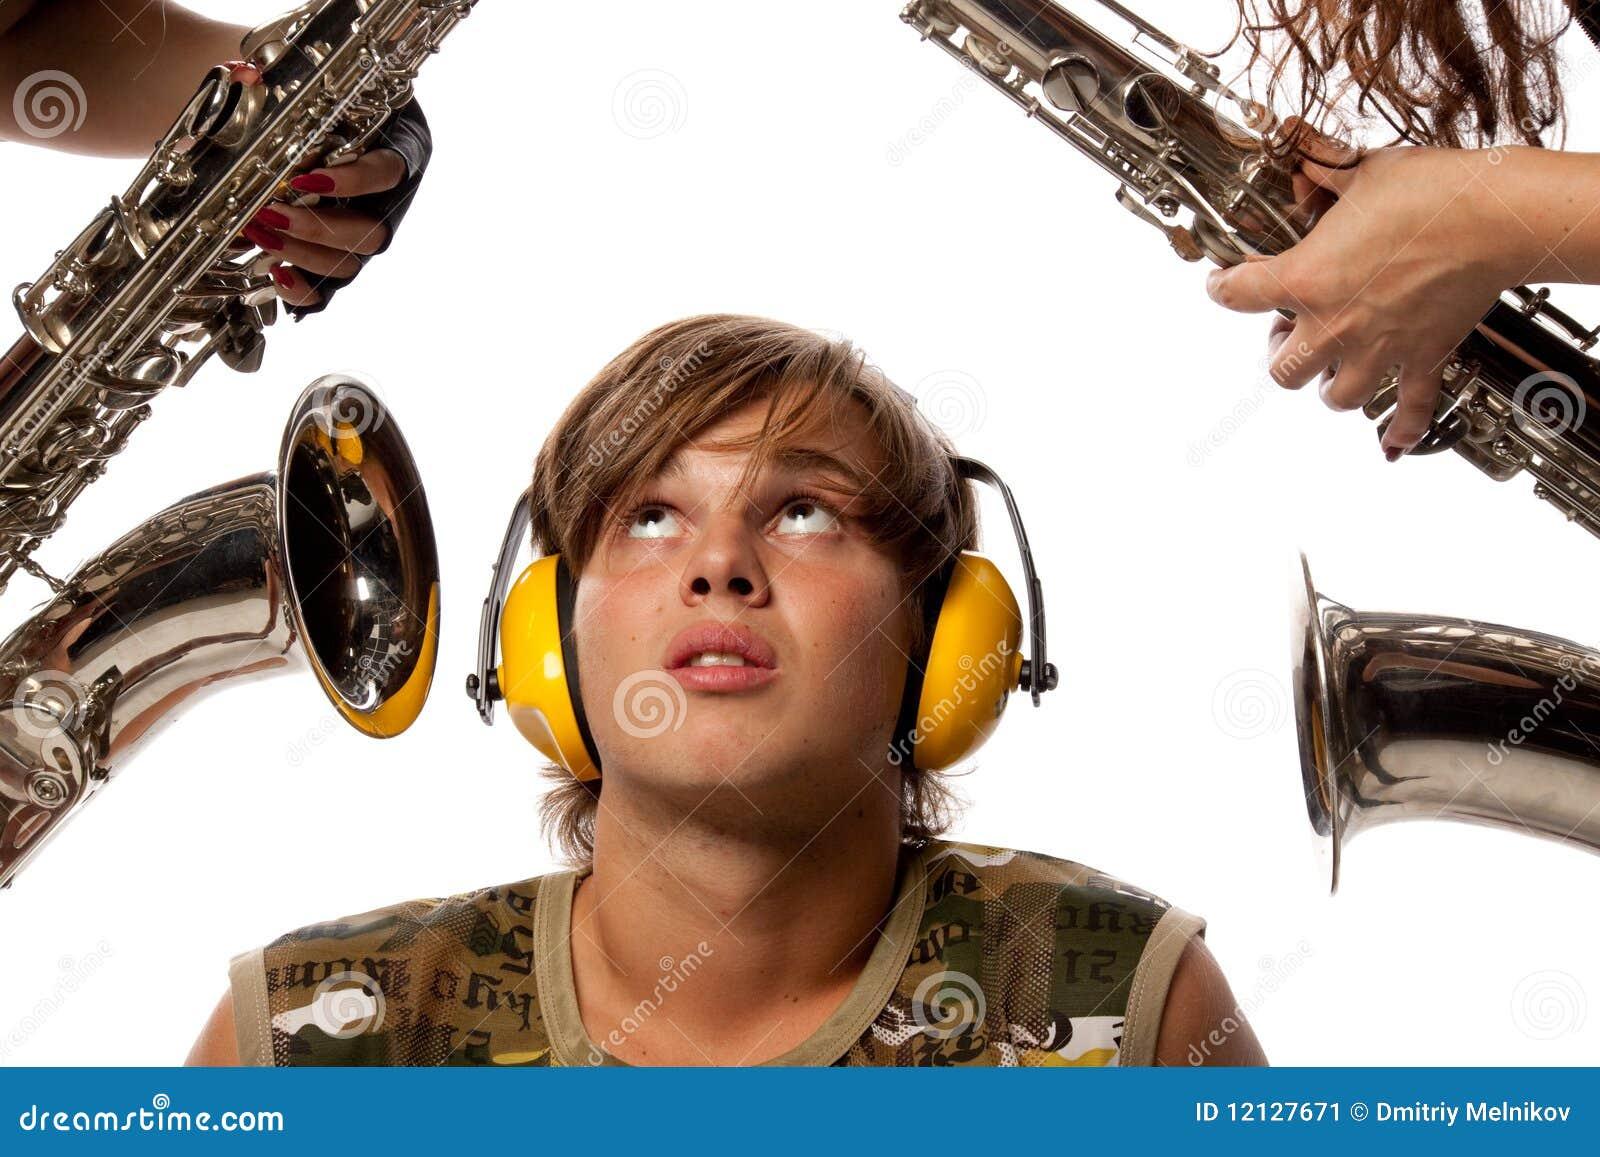 laute geräusche stockbild  bild 12127671 ~ Geschirrspülmaschine Laute Geräusche